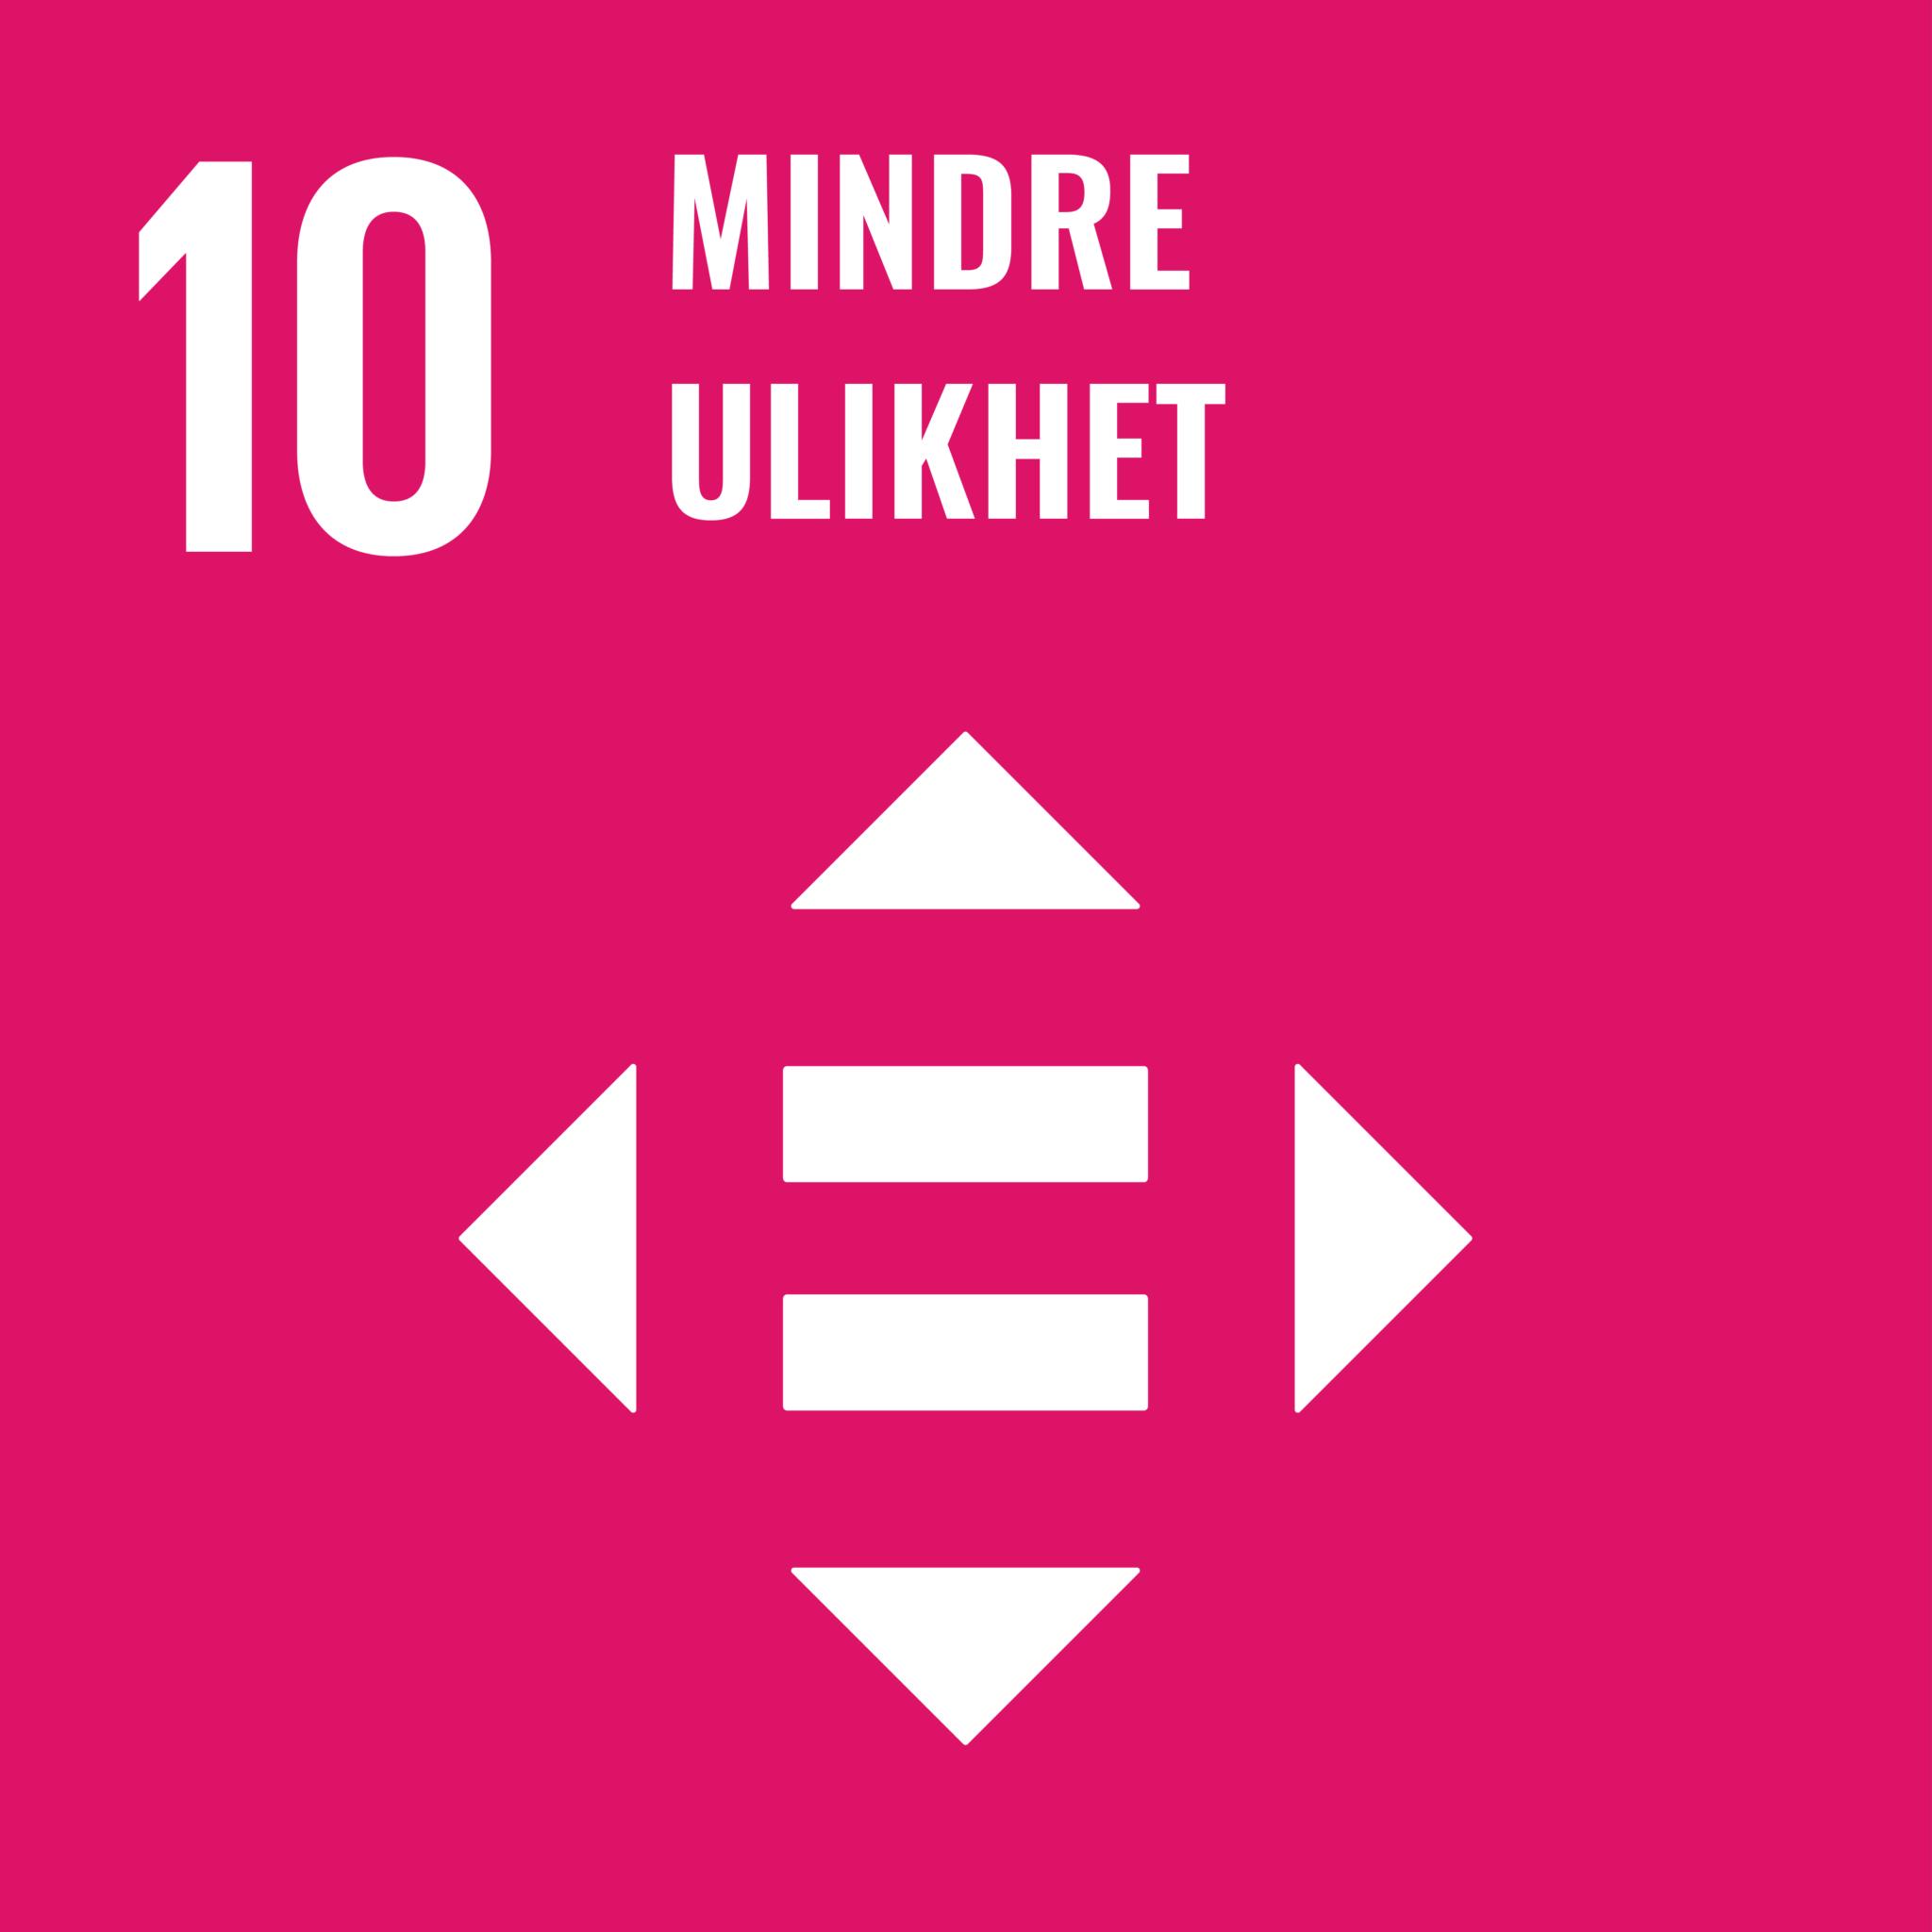 logo mål 10